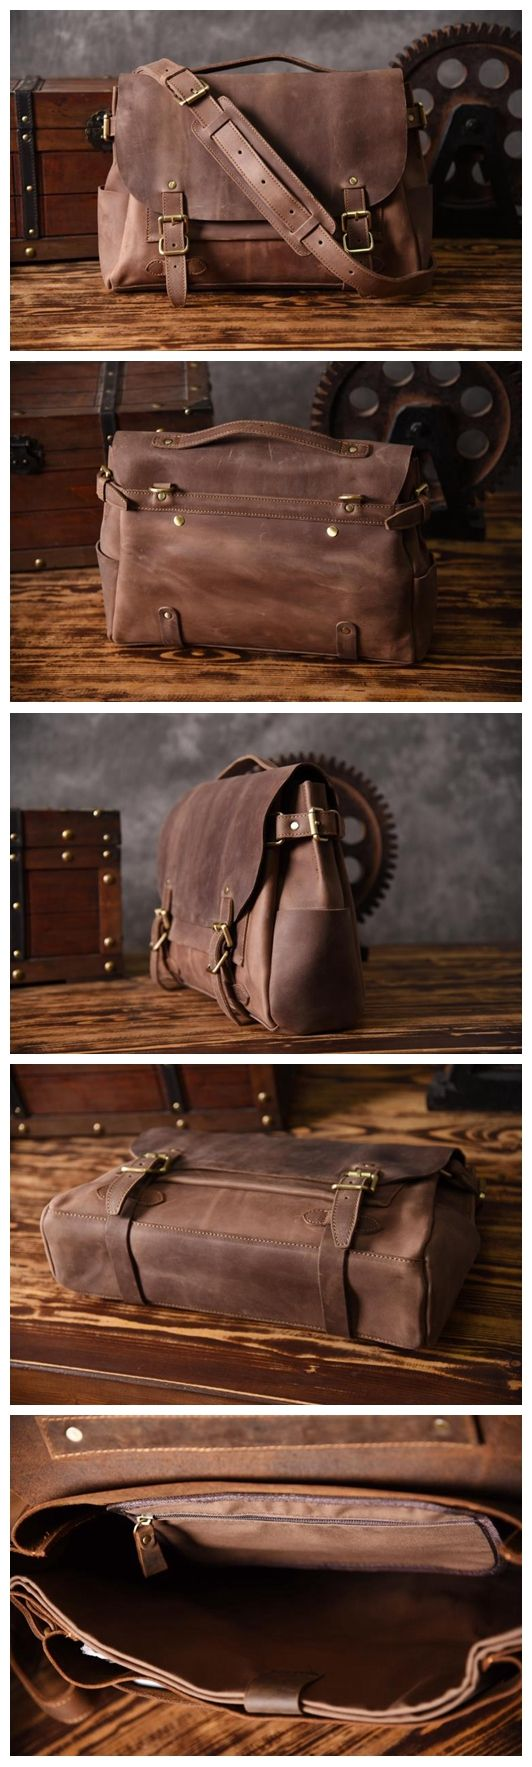 Handmade Light Brown Leather Messenger Bag Men's Handbag Laptop Bag Travel Bag MT601